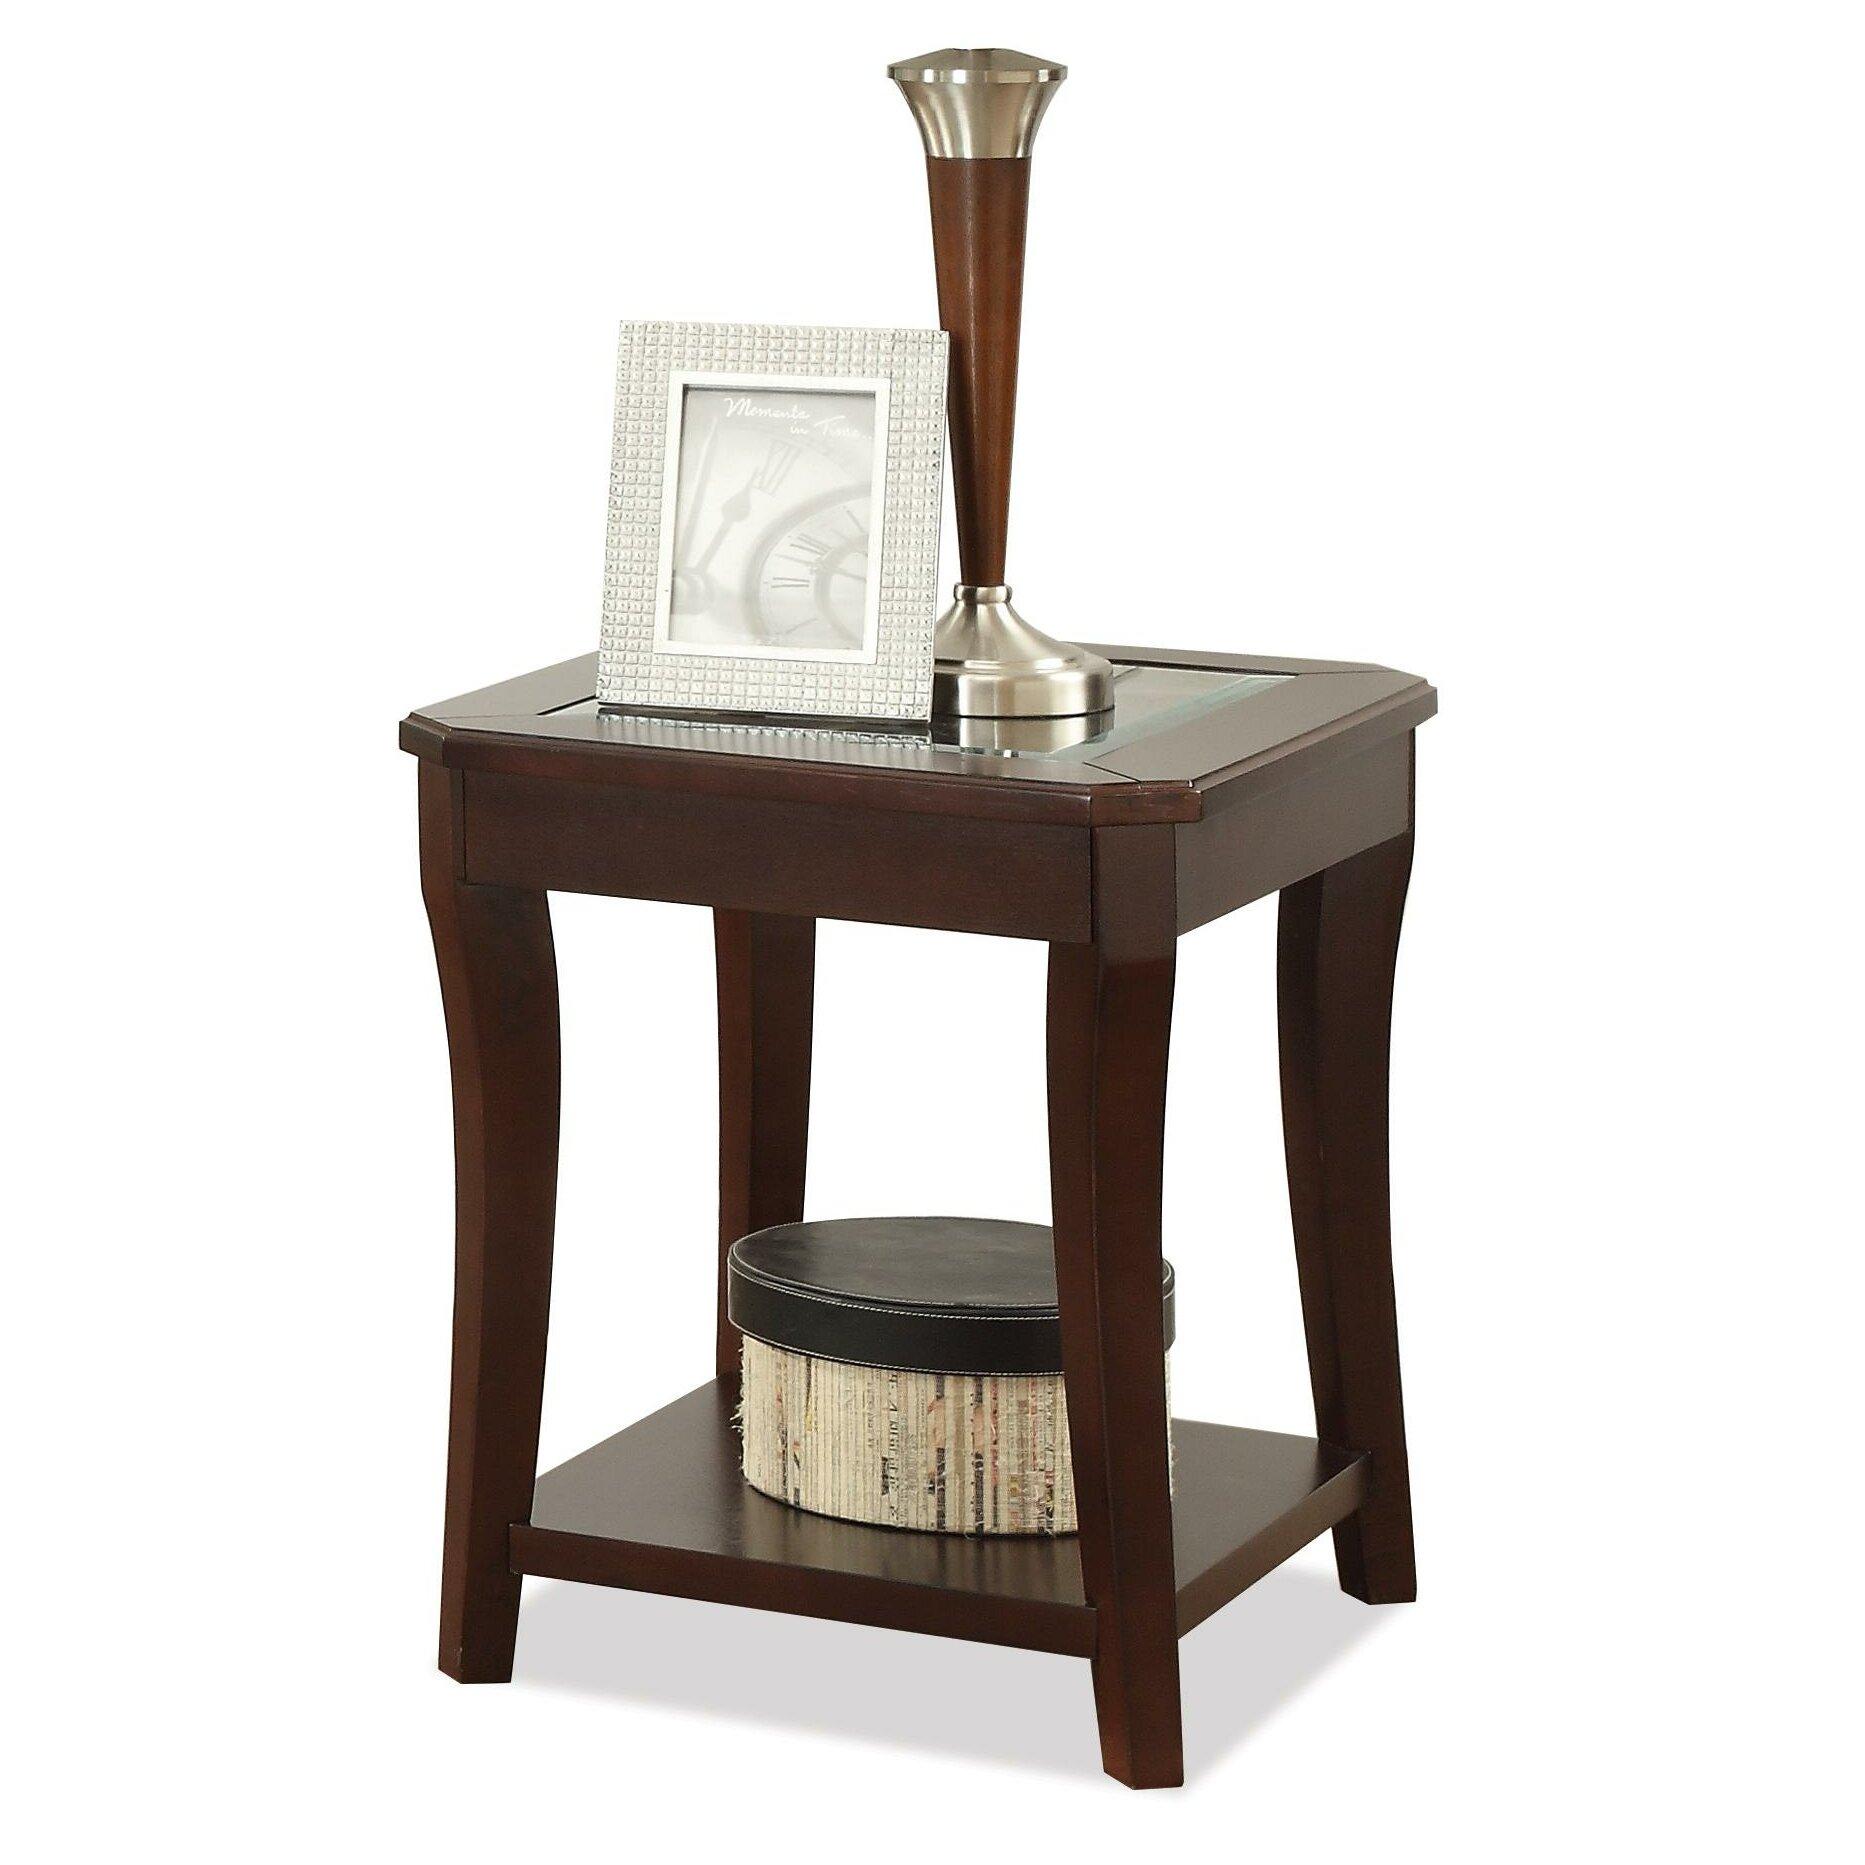 Riverside furniture bancroft end table reviews wayfair for Wayfair shop furniture